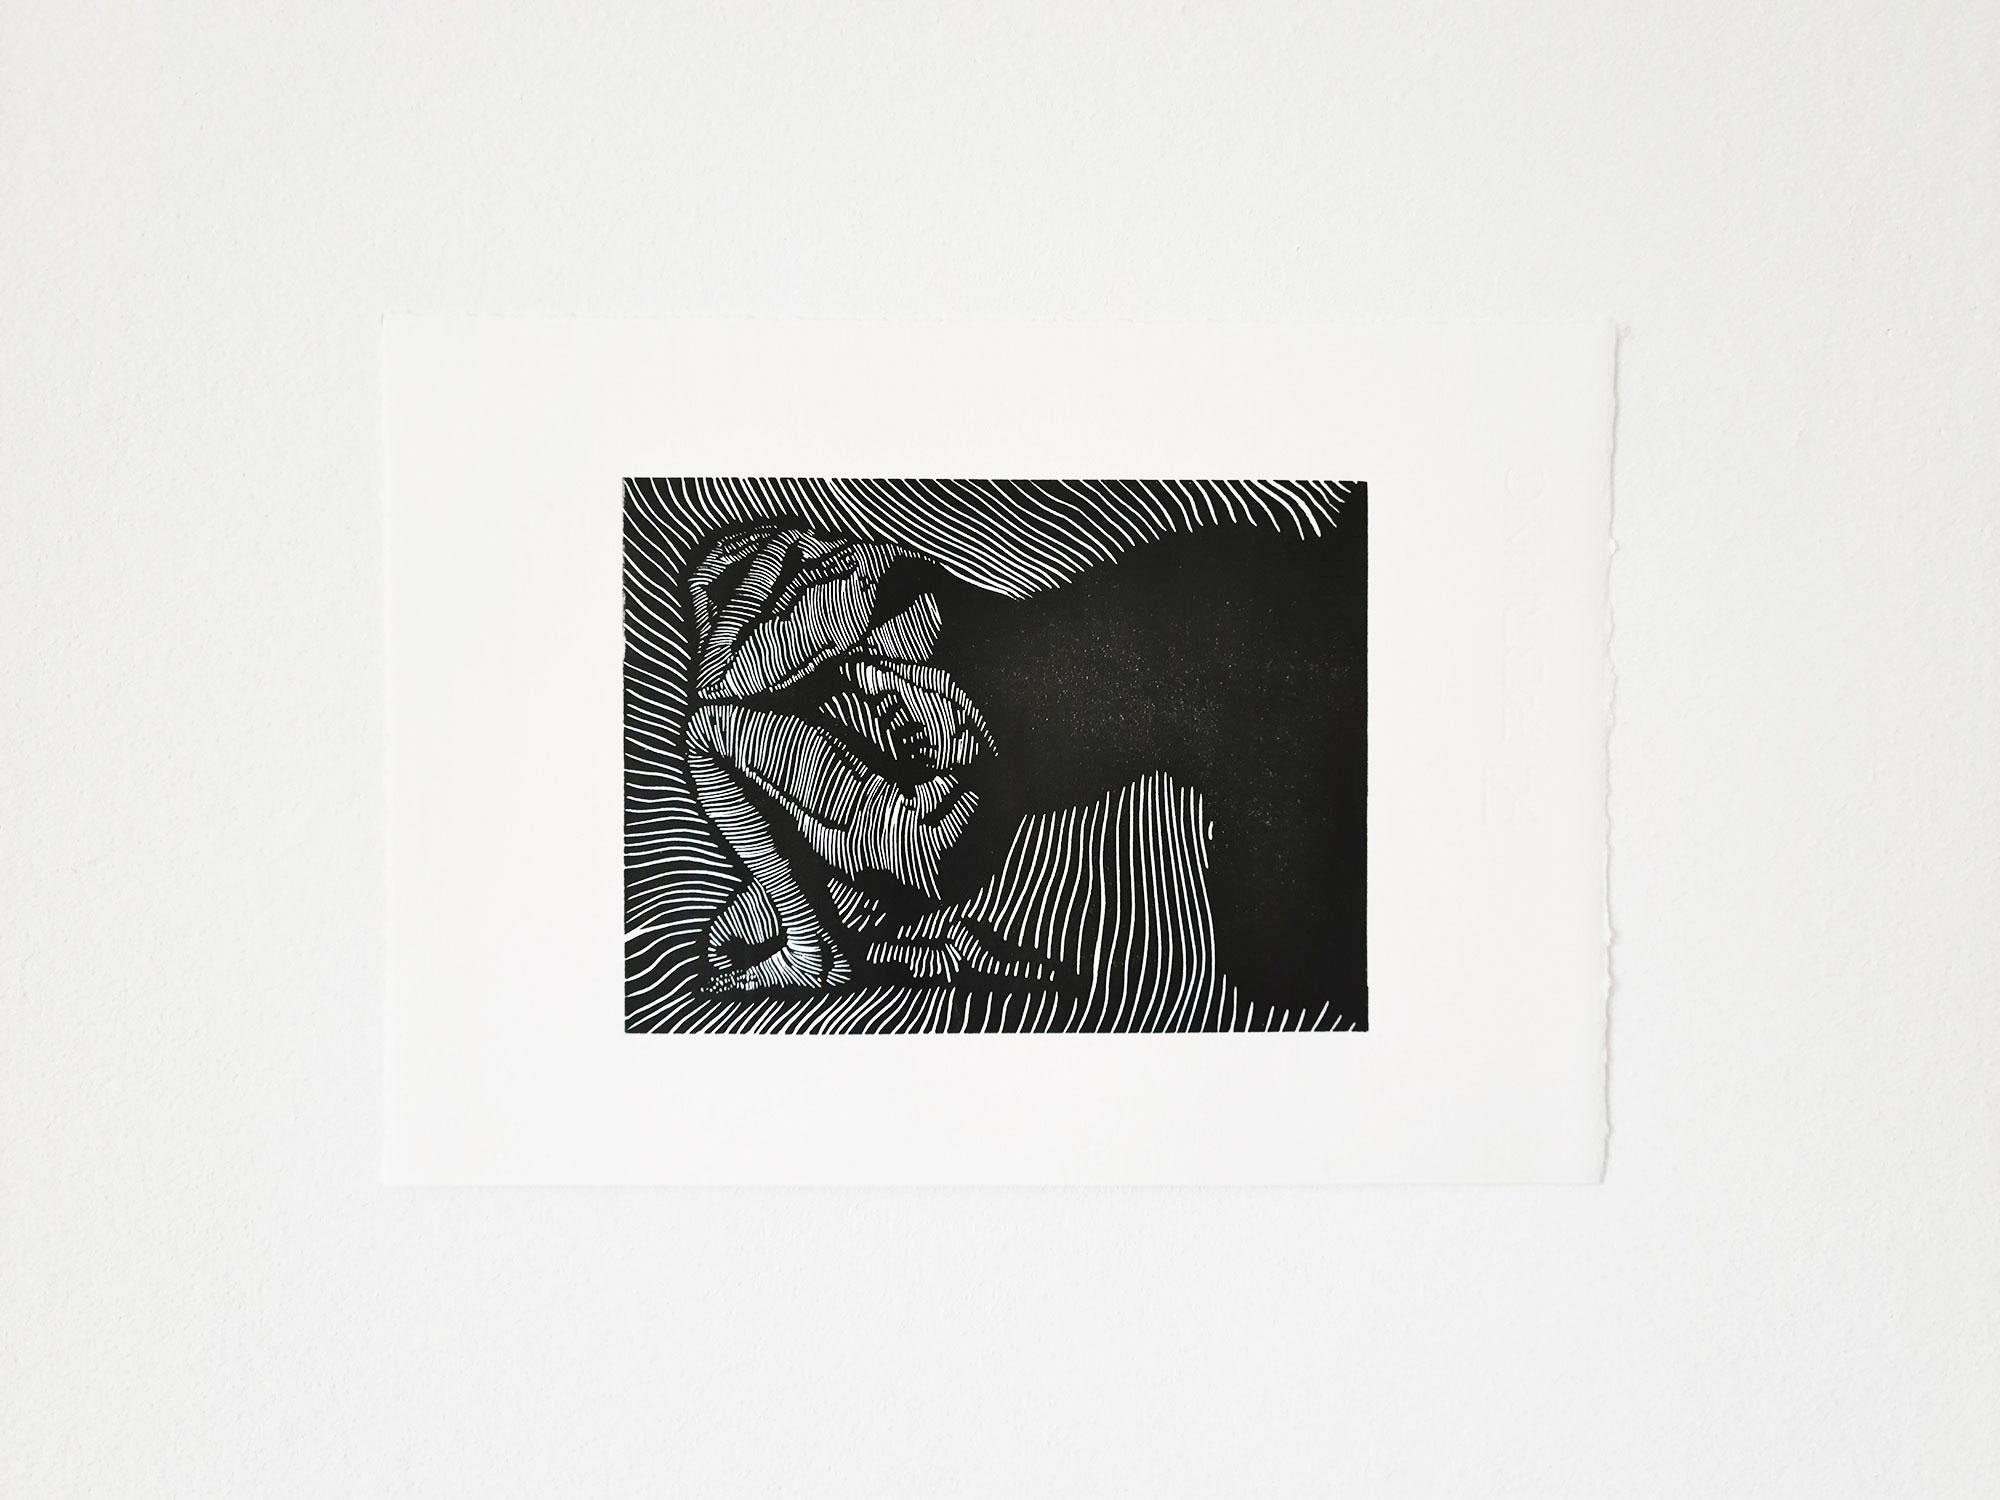 Obsoletus, A4, 2021, Linoldruck auf Büttenpapier